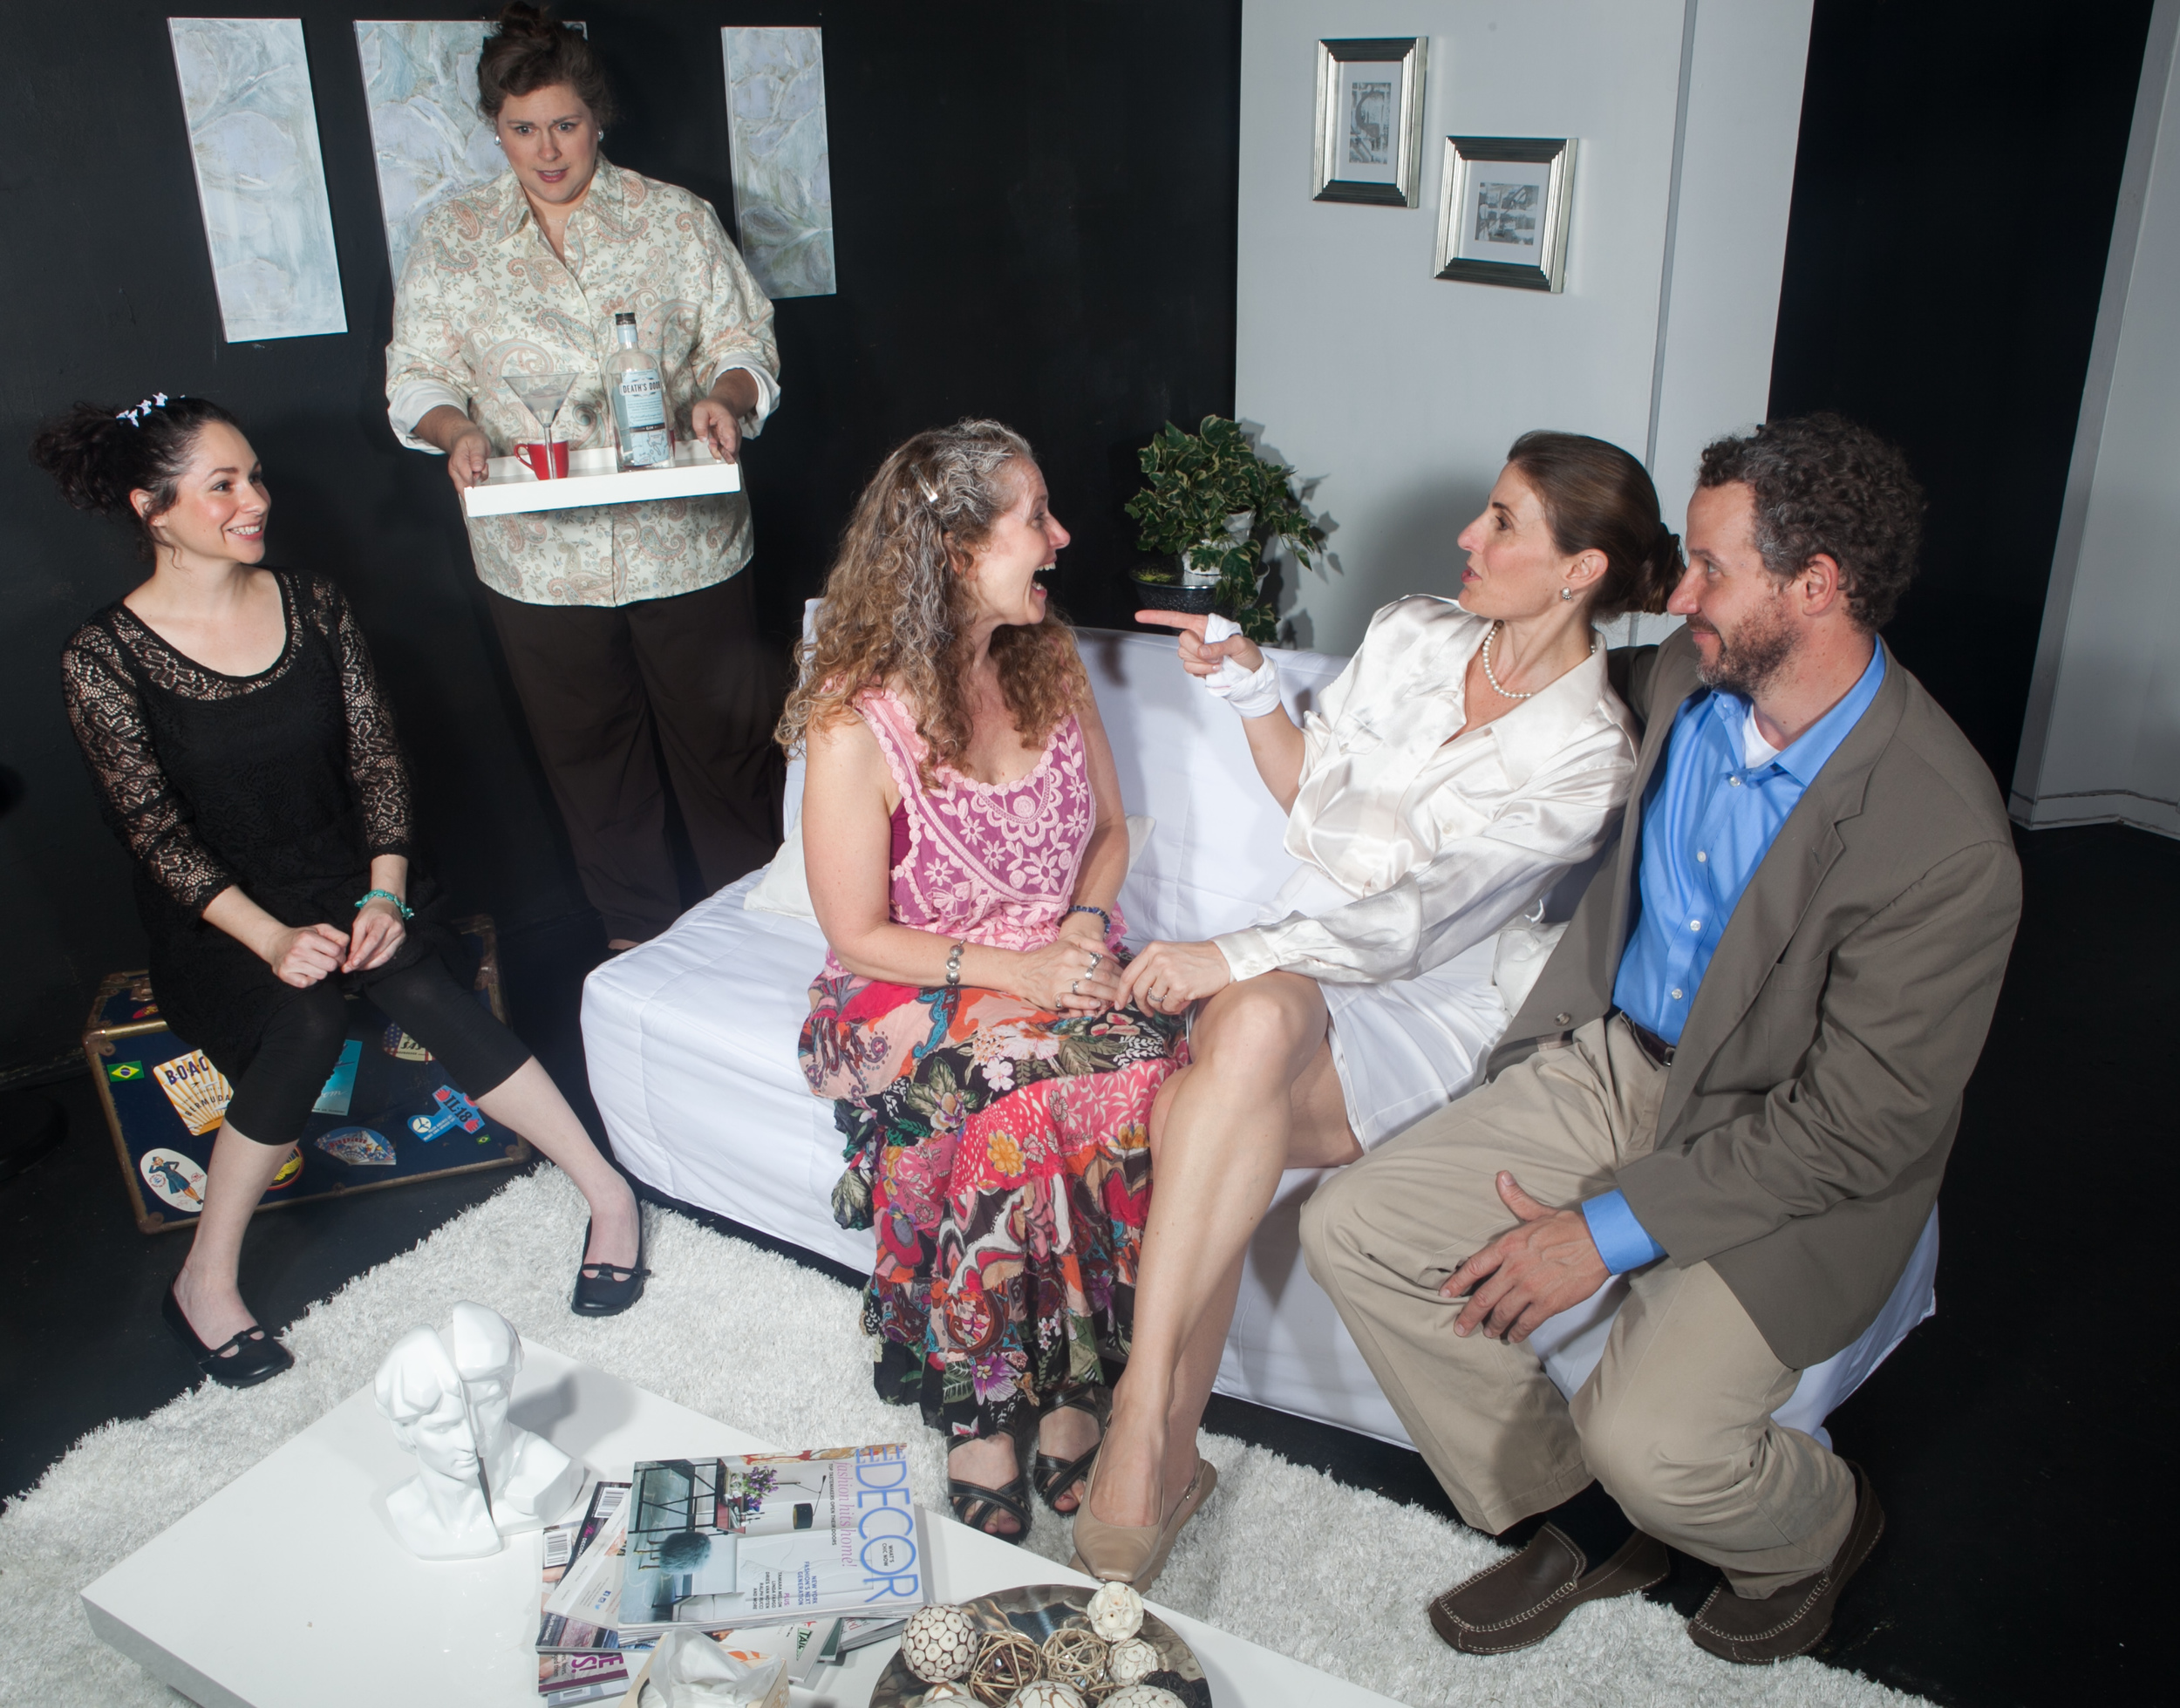 Jaimelyn Gray (Matilde), Deborah Hearst (Virginia), Laura Sturm (Ana), Susan Steinmeyer (Lane), and Joe McCauley (Charles)